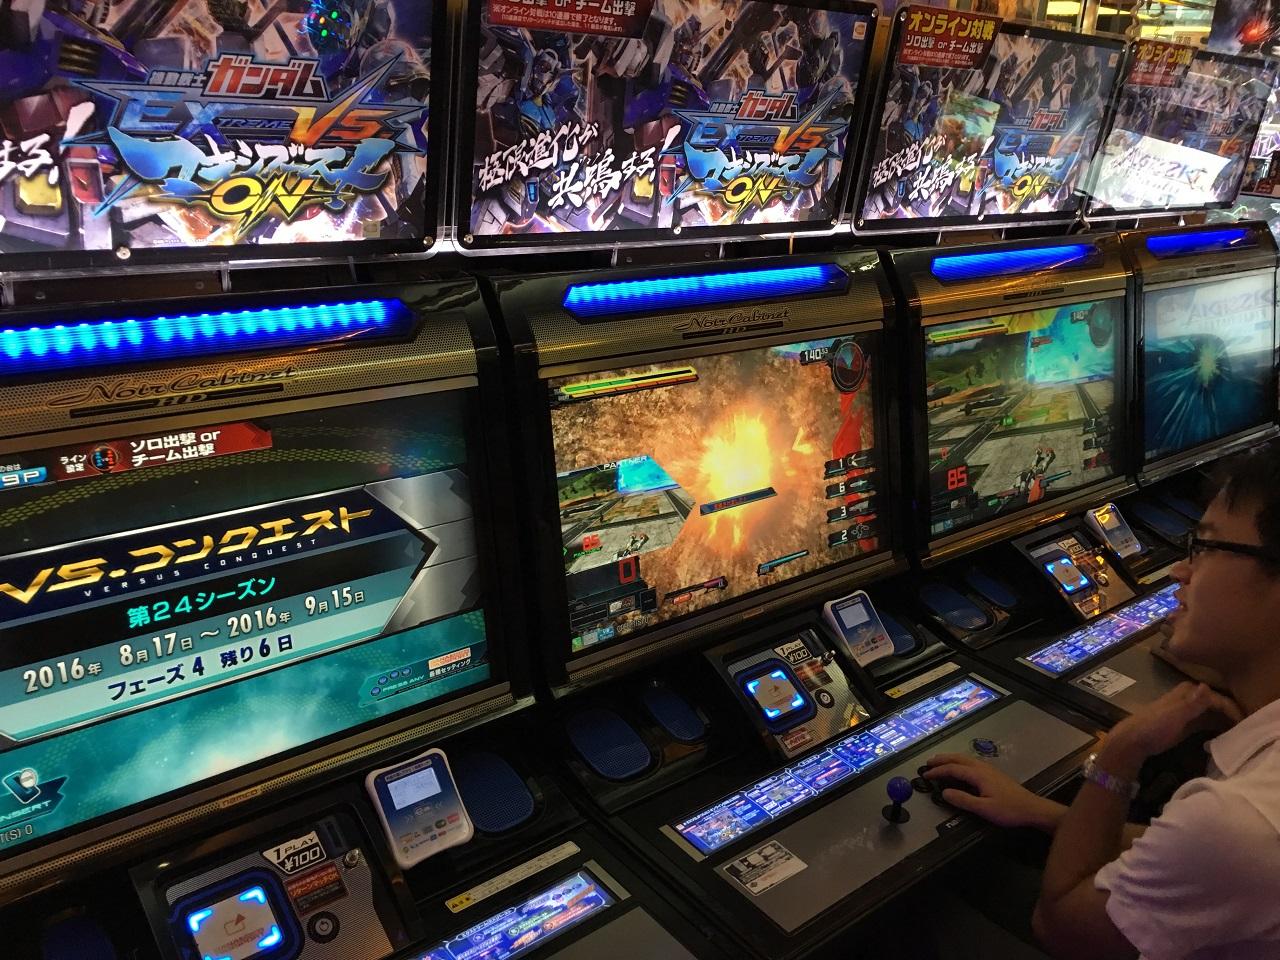 160912_28827_tgs_2016_arcade_2.JPG